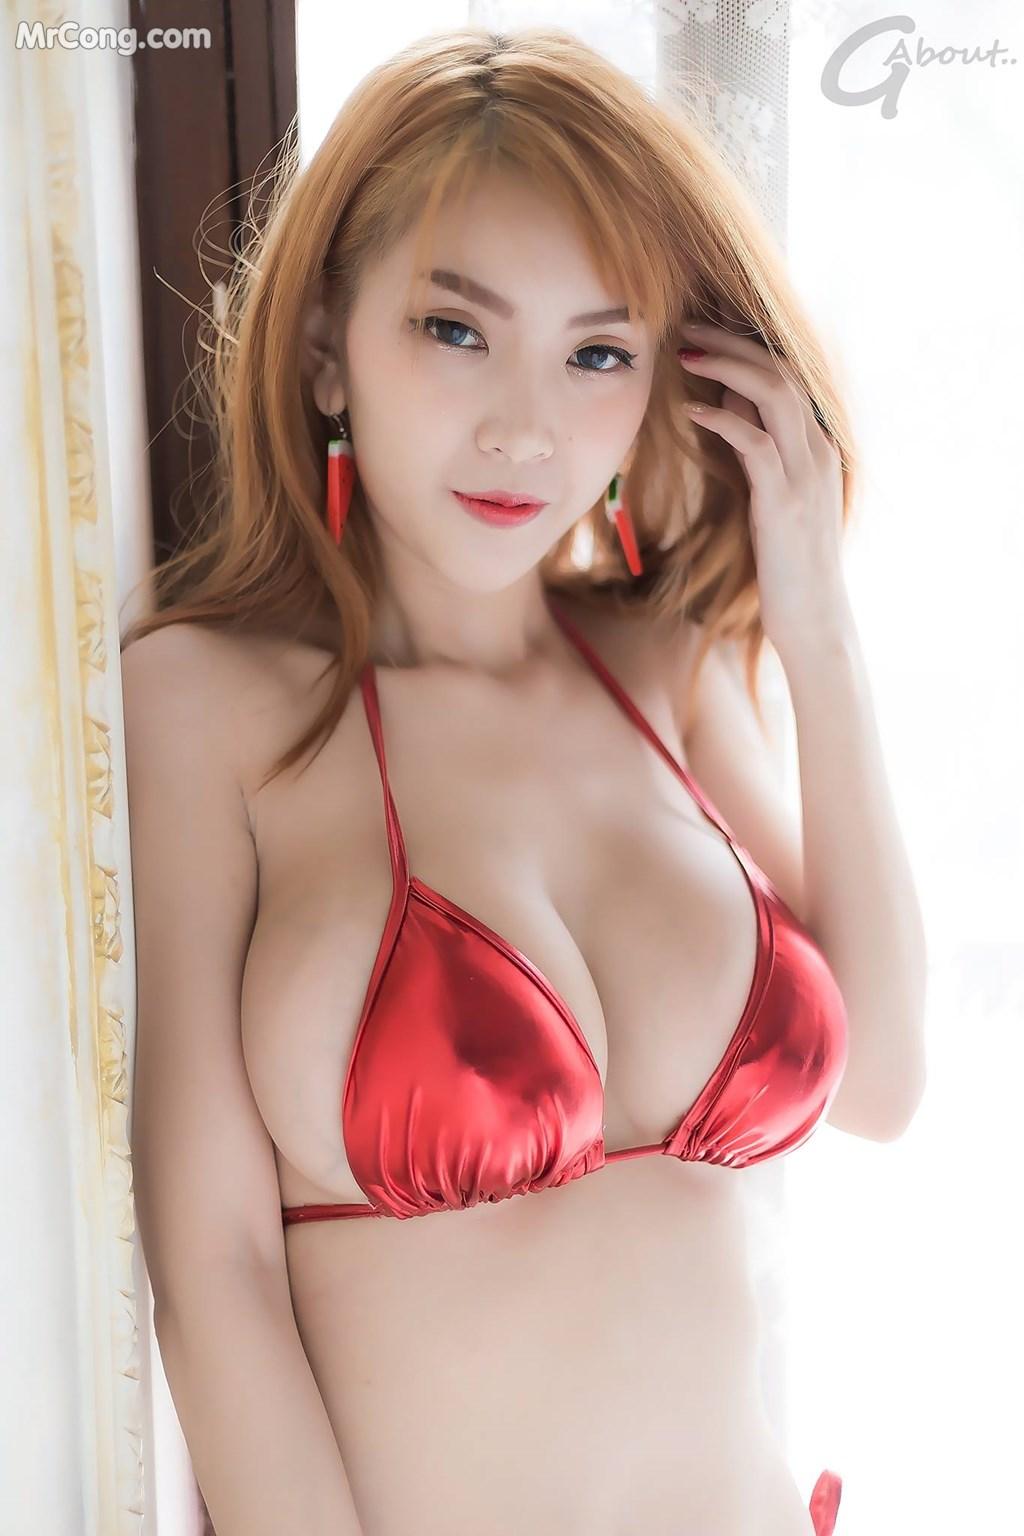 Image Thai-Model-No.482-Alisa-Rattanachawangkul-MrCong.com-006 in post Thai Model No.482: Người mẫu Alisa Rattanachawangkul (9 ảnh)